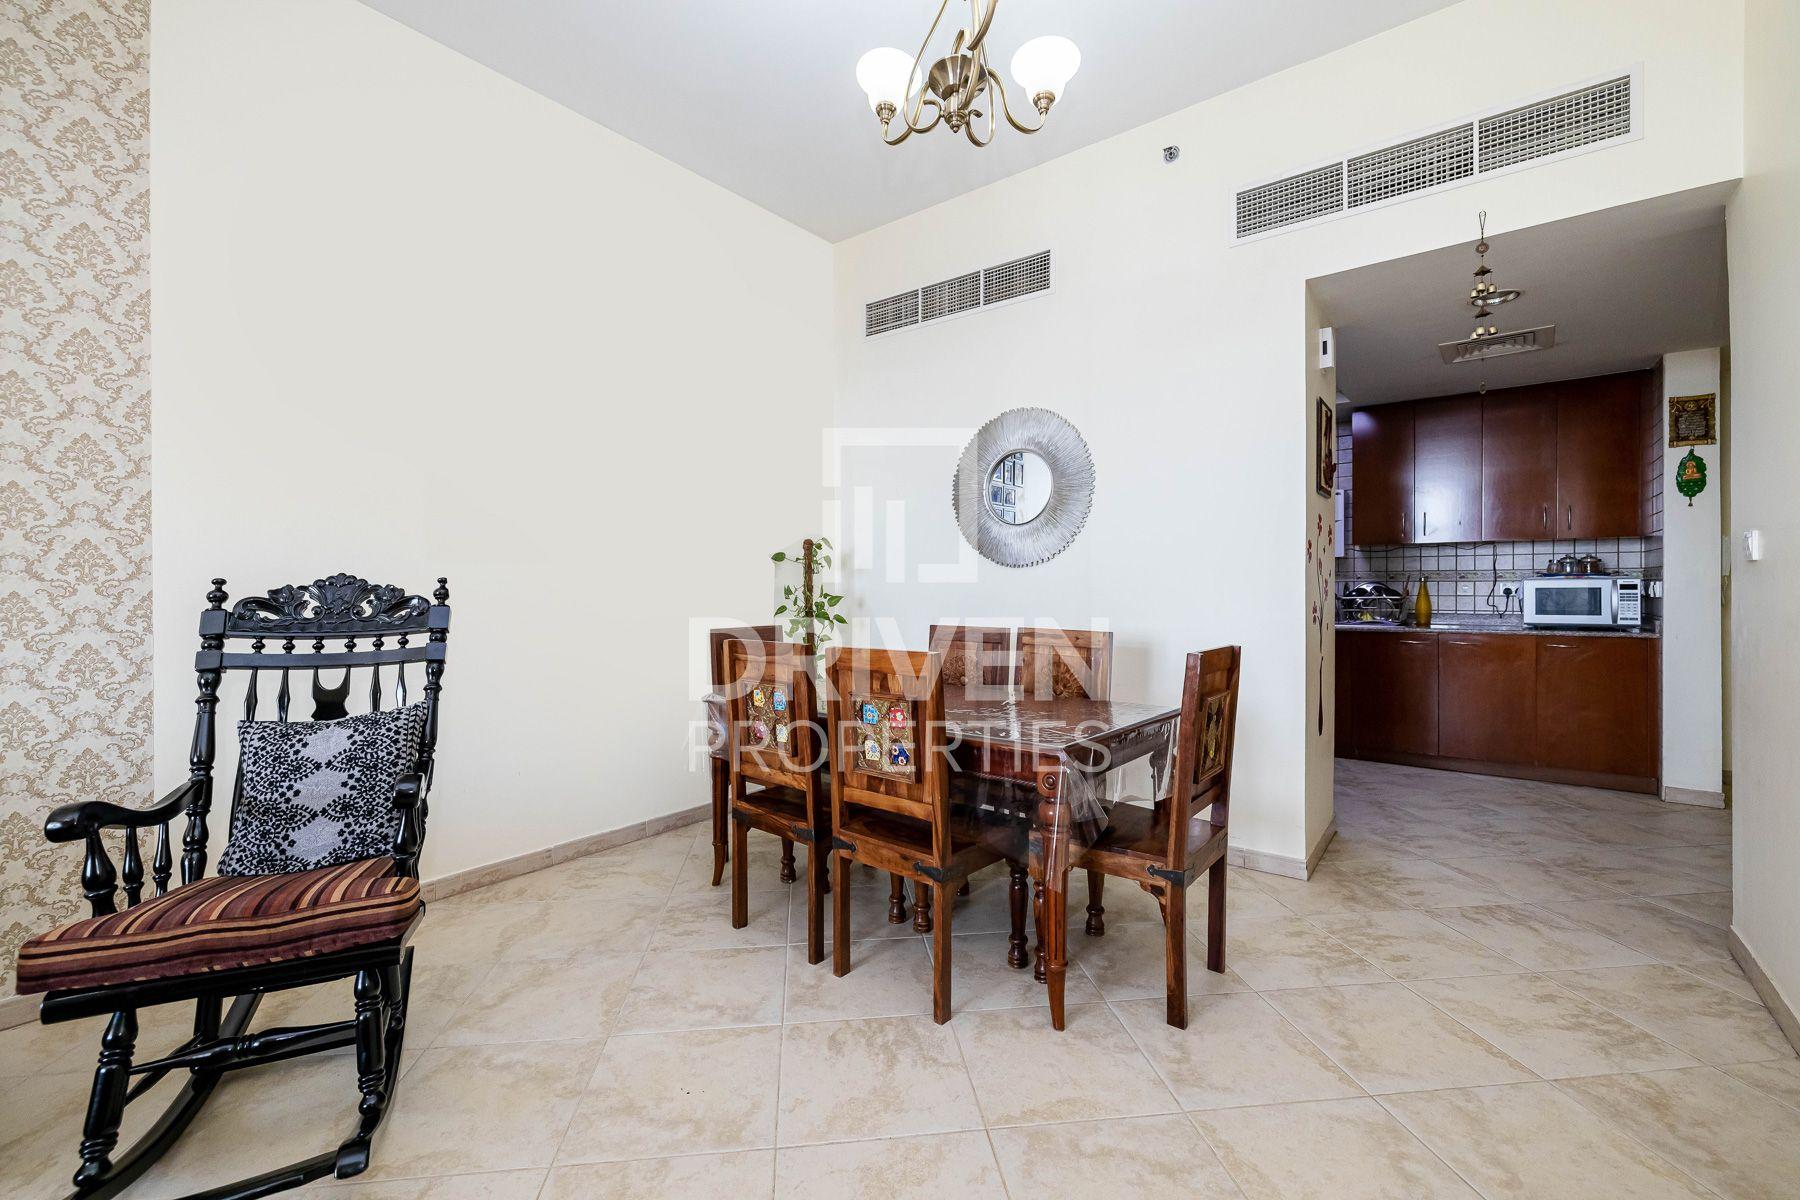 Apartment for Rent in New Bridge Hills 1 - Motor City